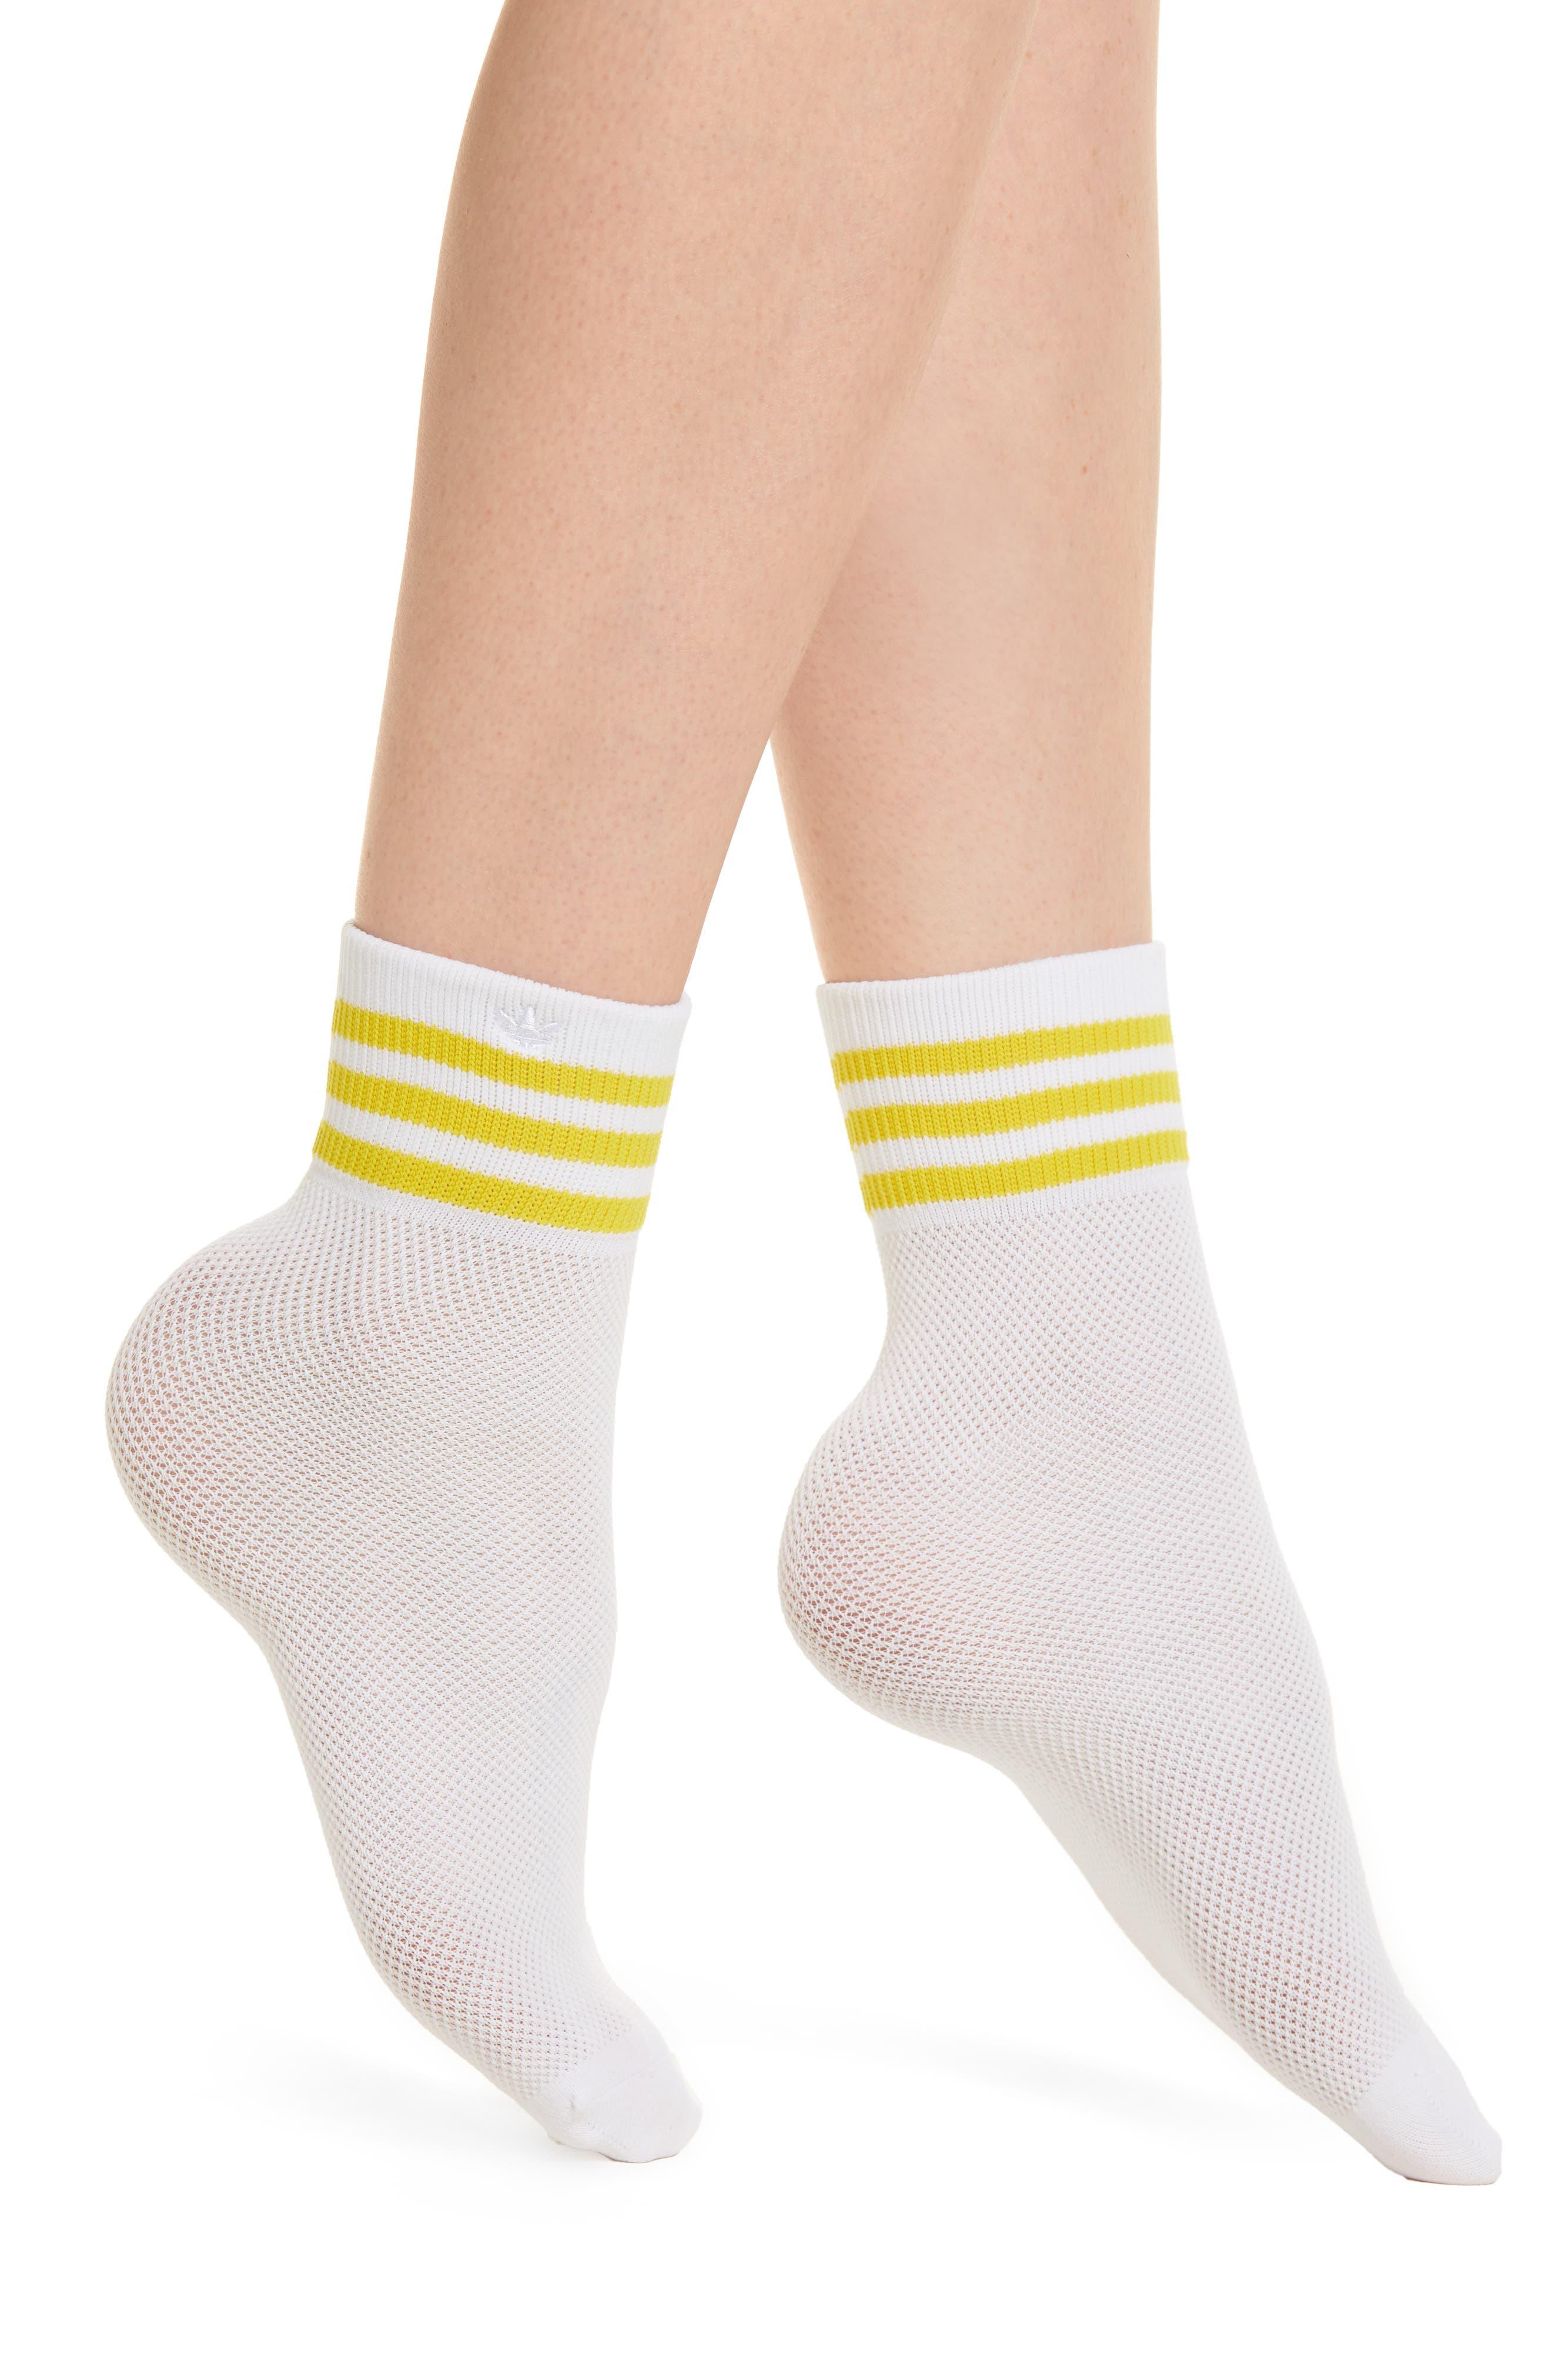 Stripe Mesh Ankle Socks,                         Main,                         color, White/ Yellow